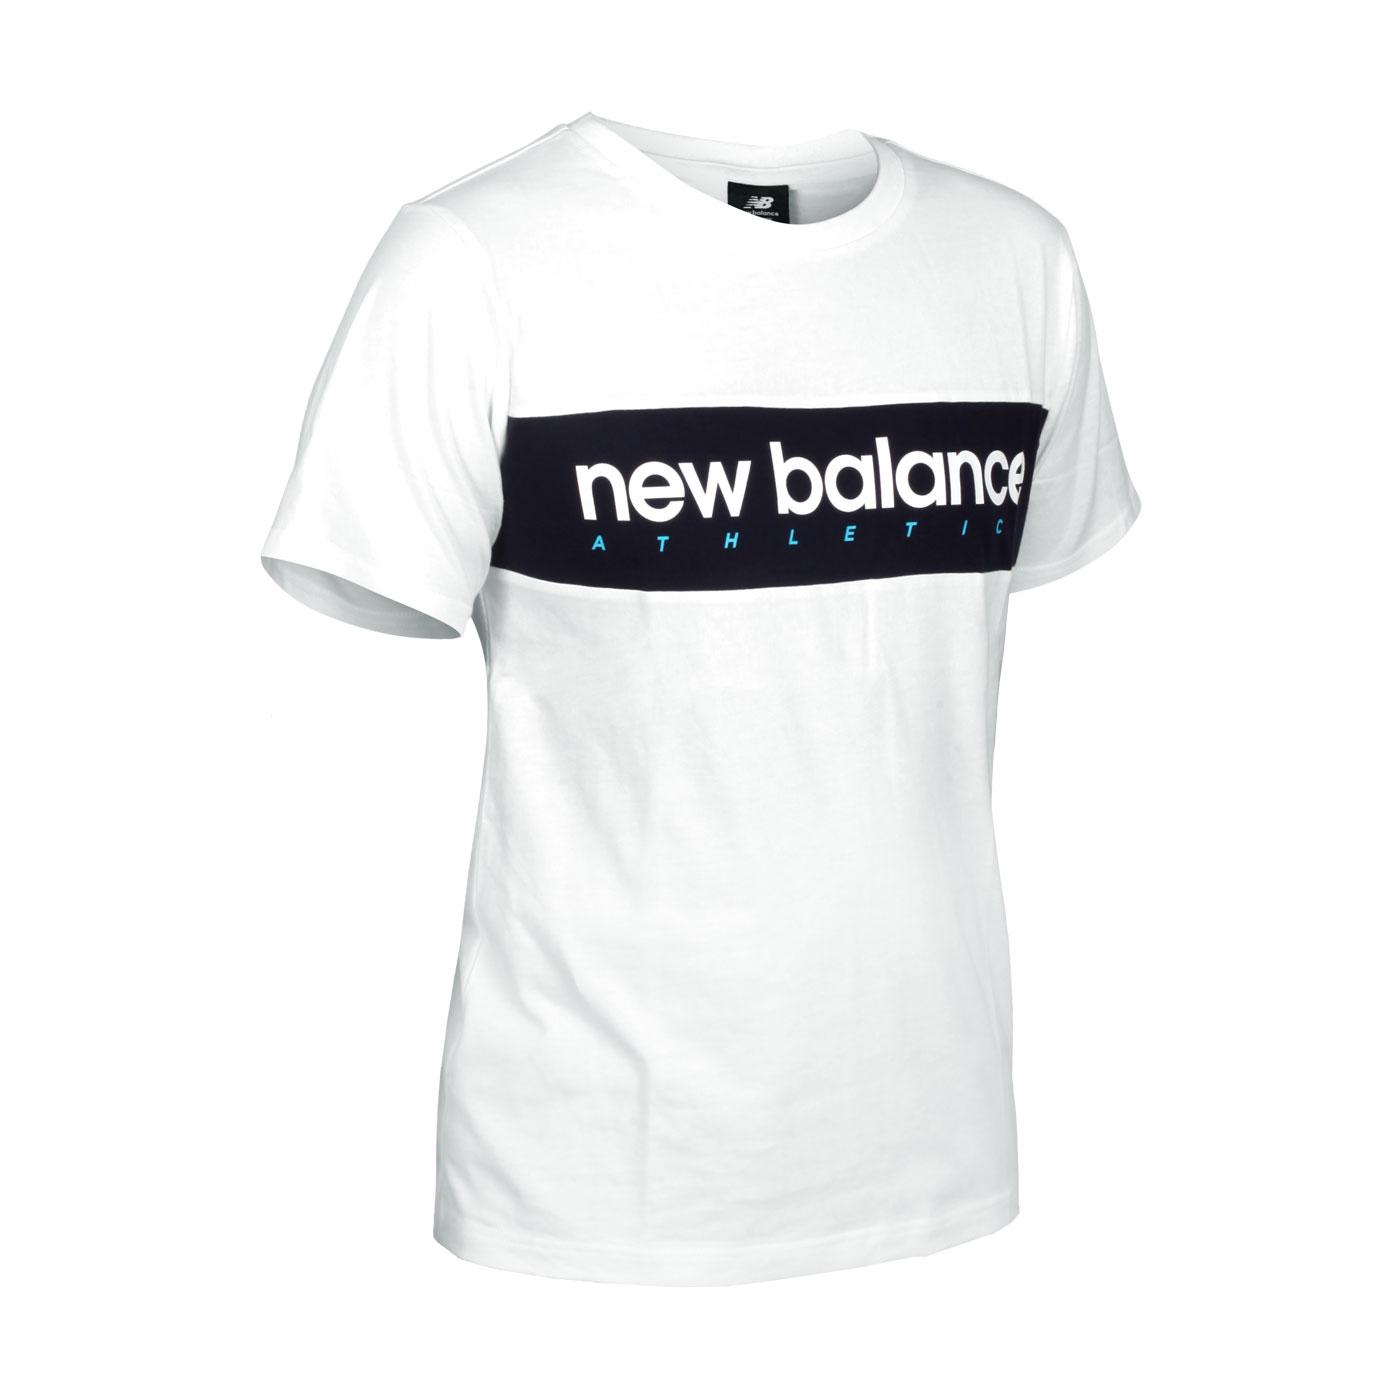 NEW BALANCE 男款橫條品牌短袖T恤 AMT11548WT - 白丈青